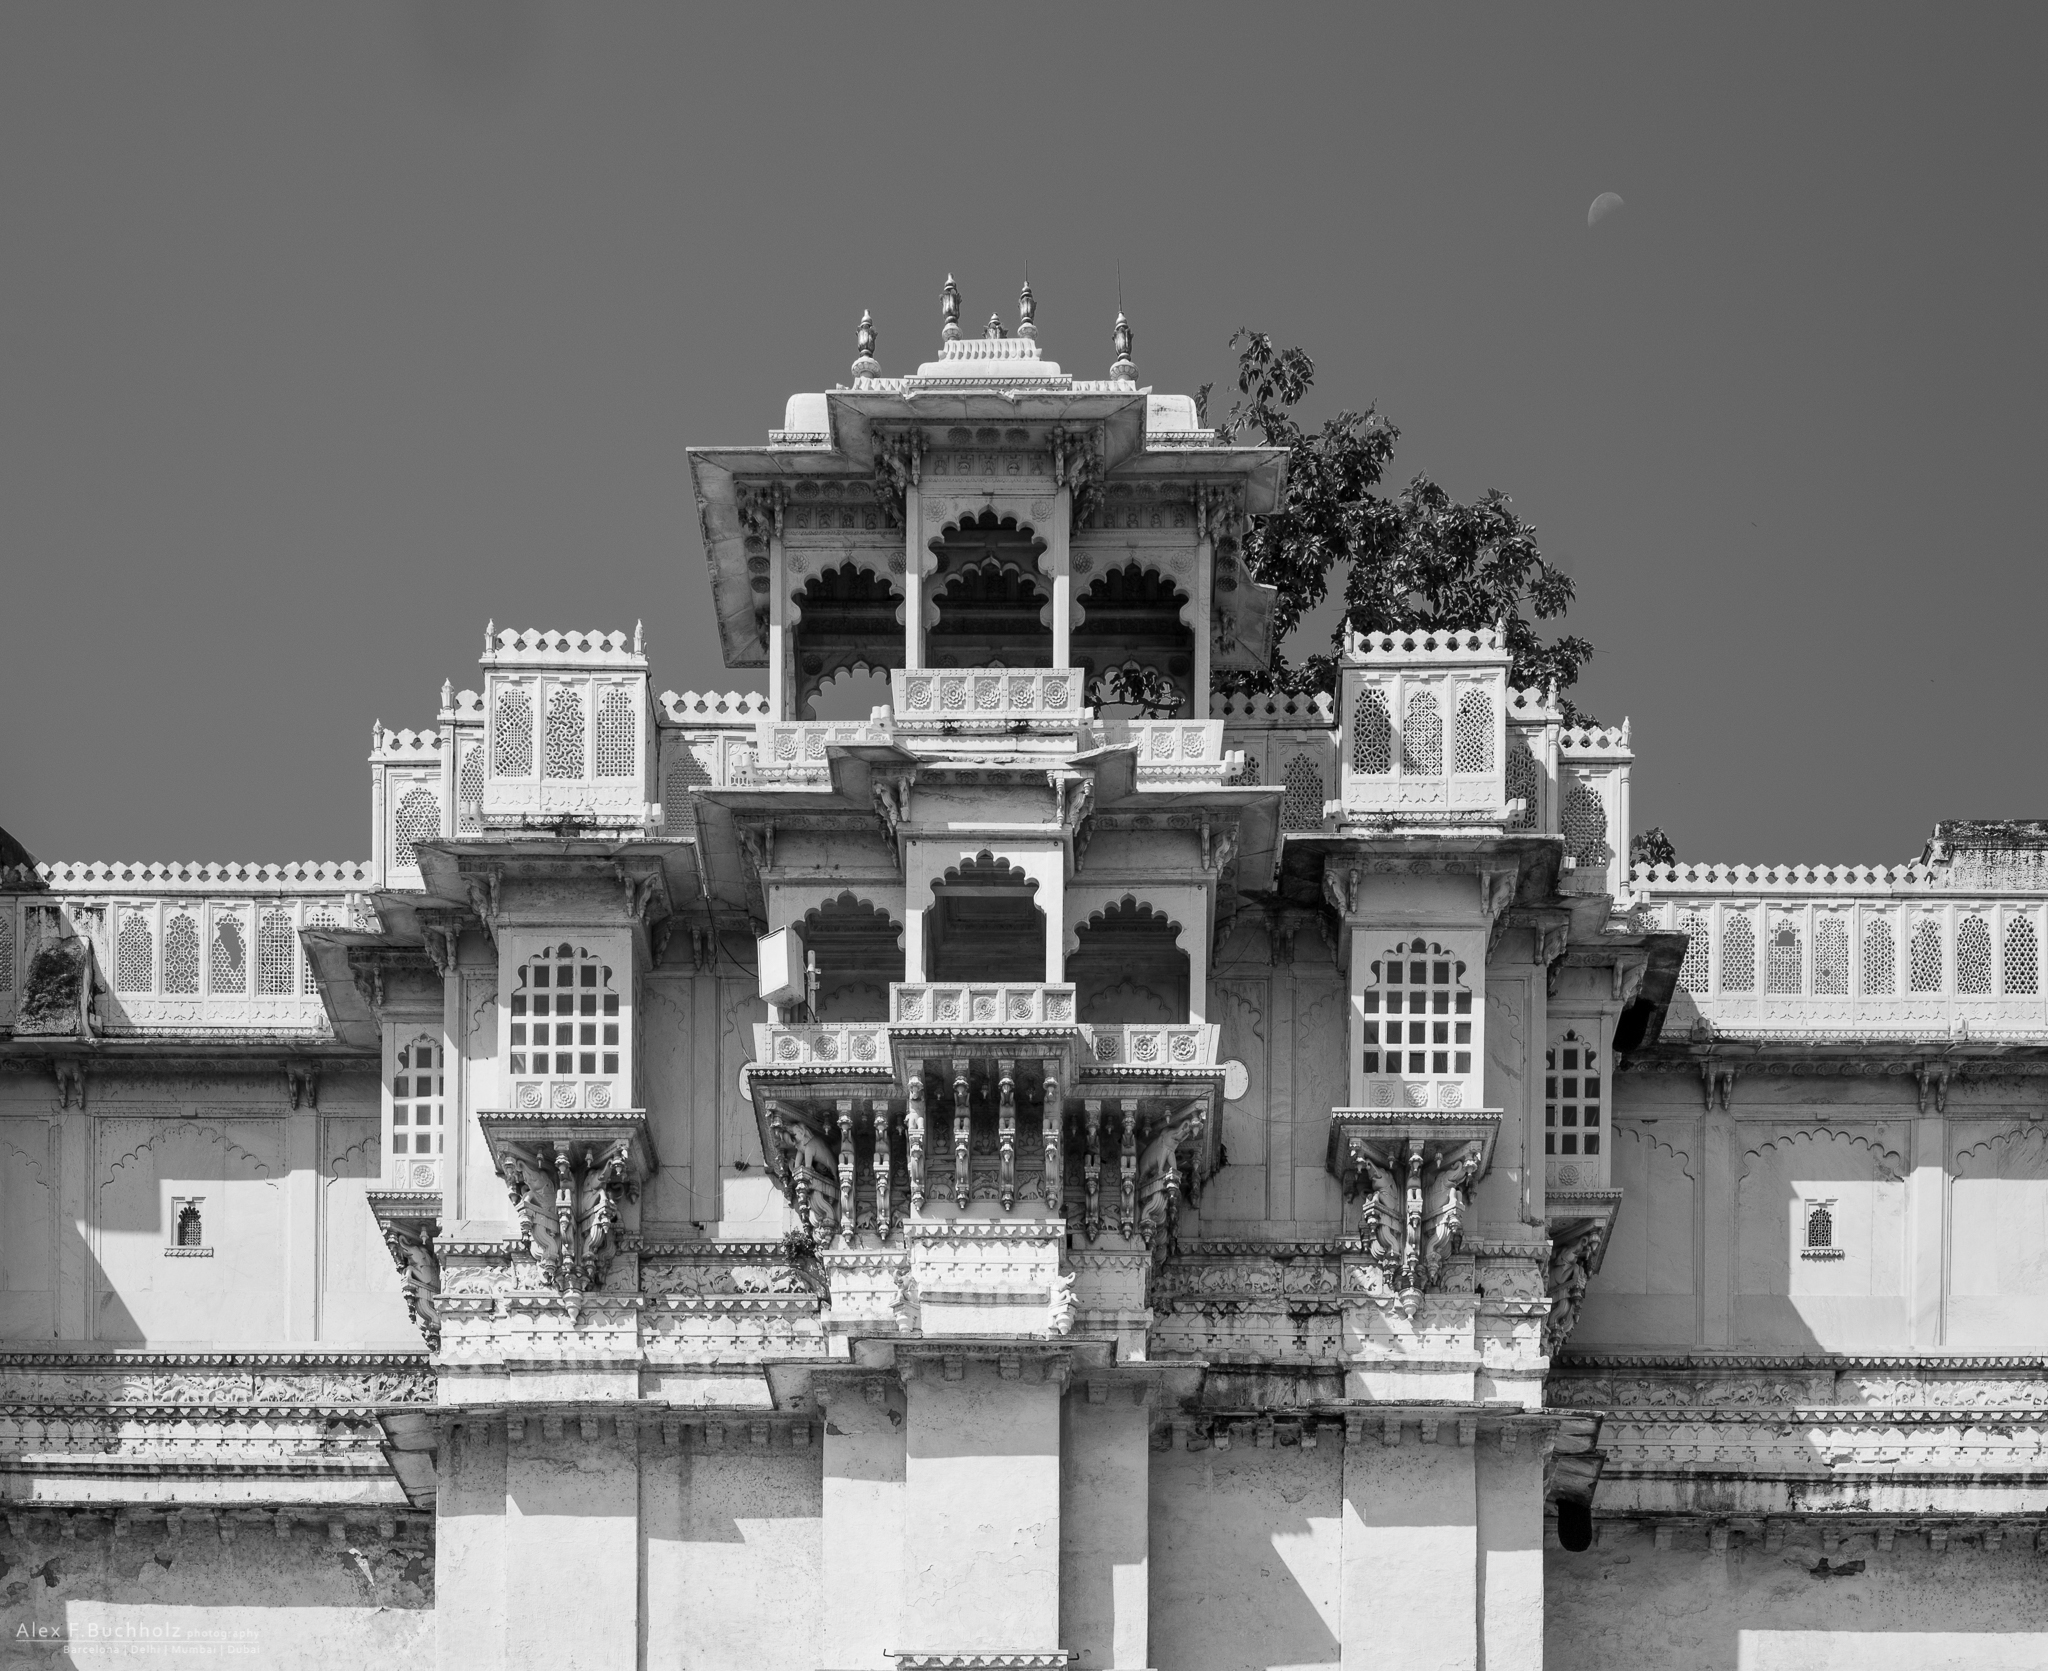 AFB15-Udaipur-0113